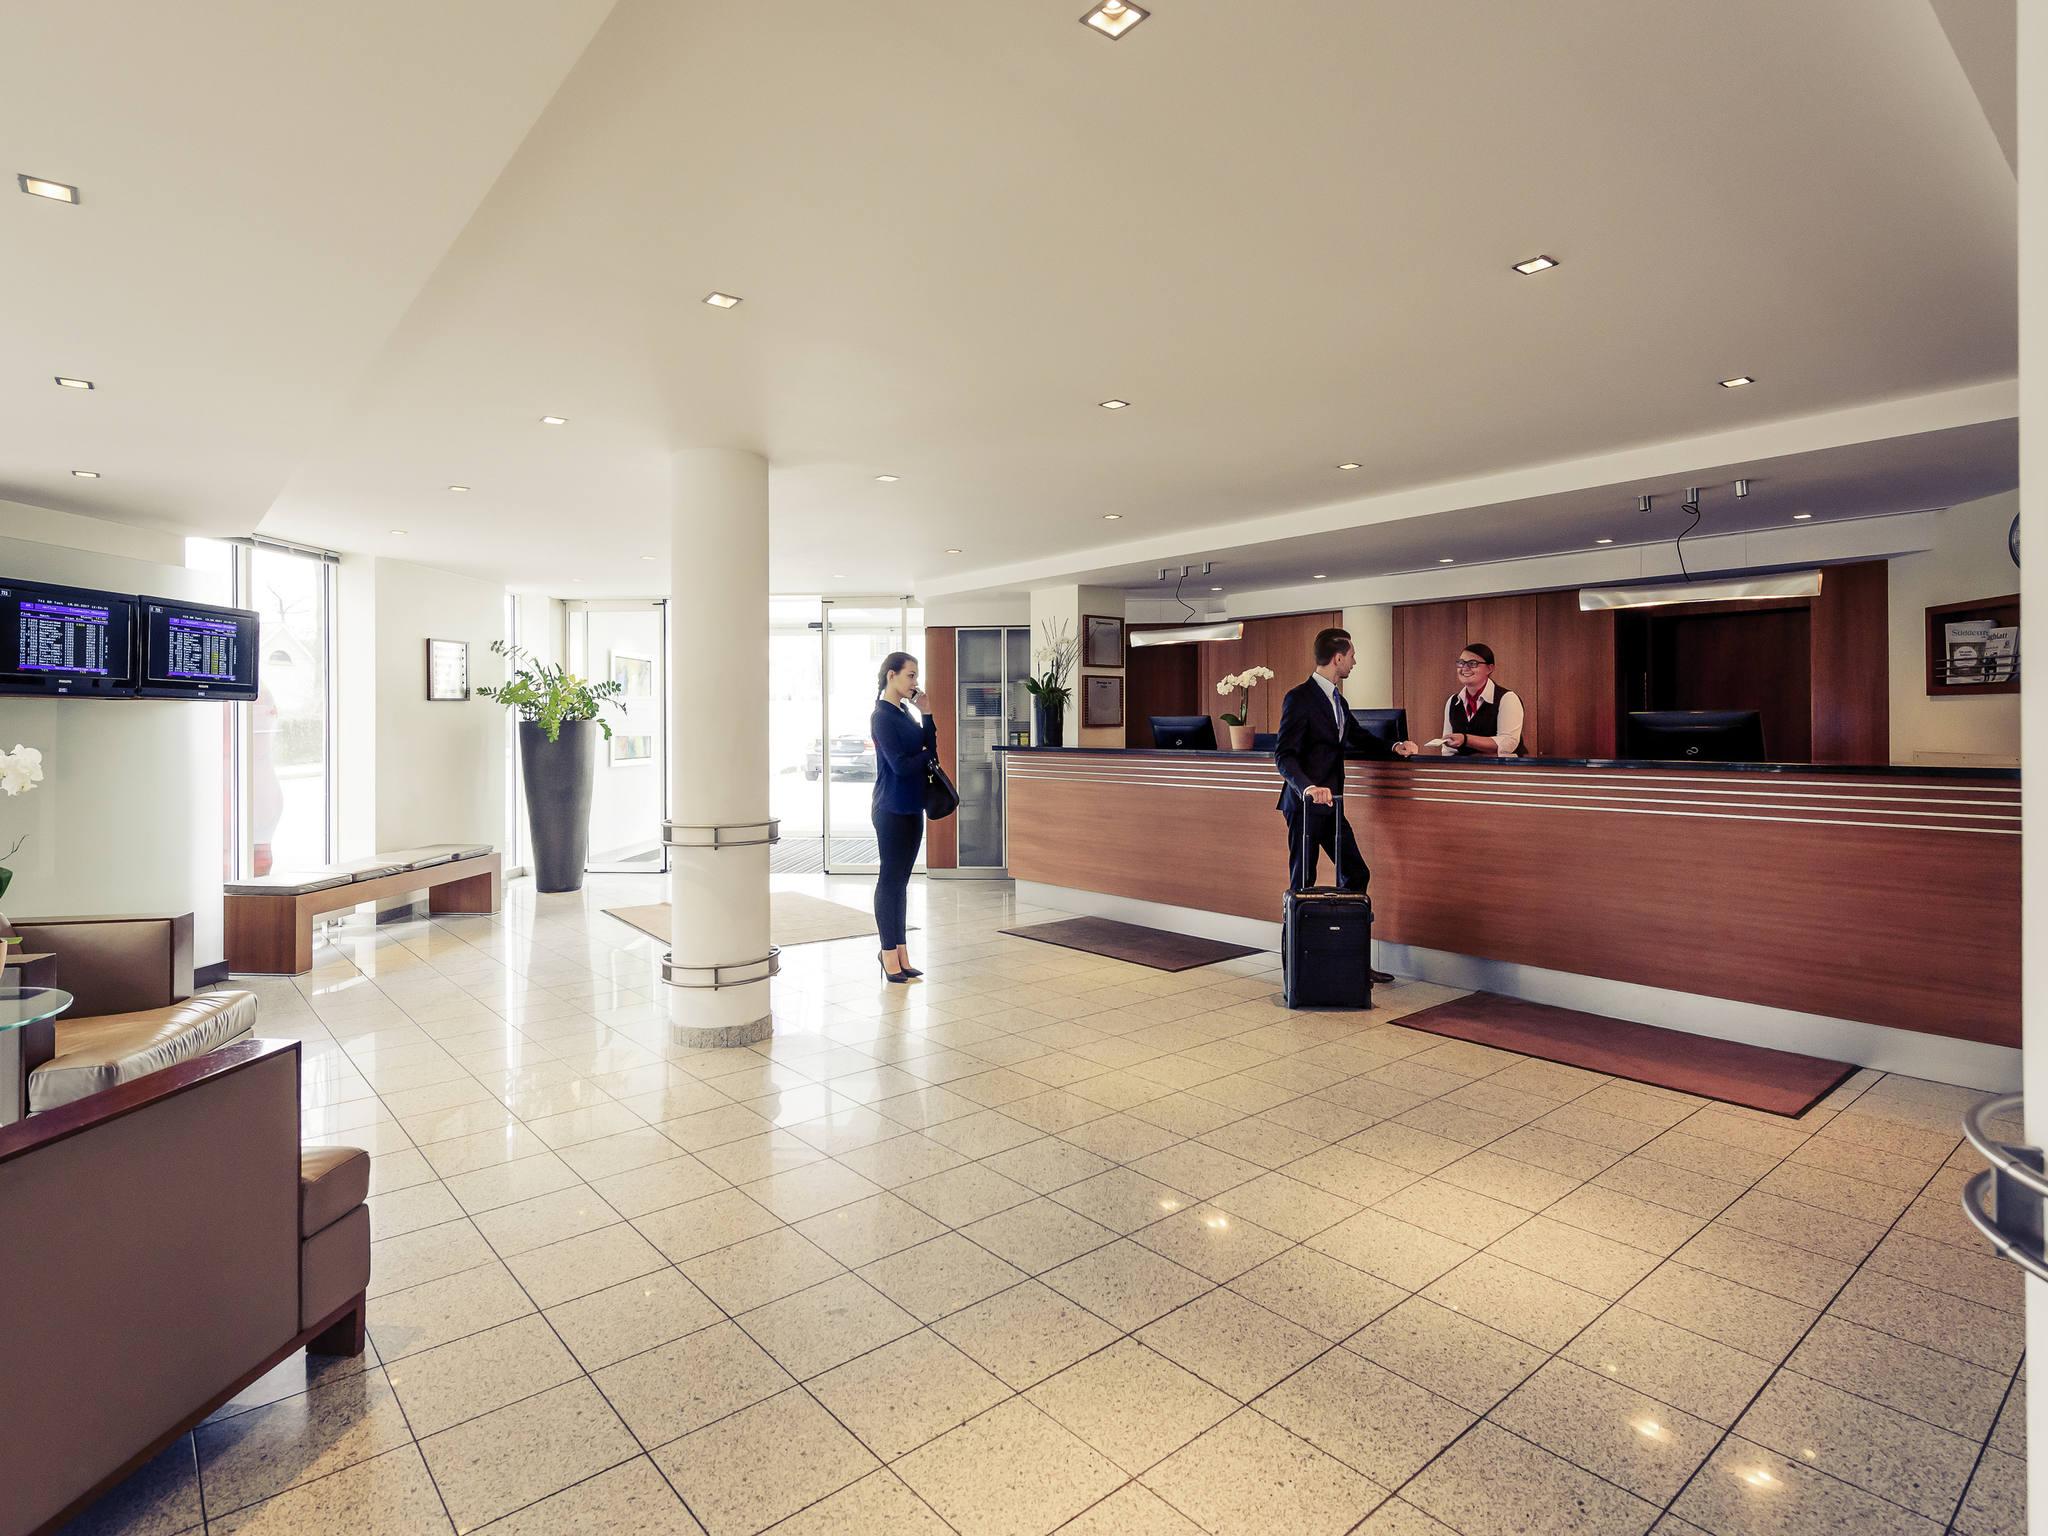 Design Len München hotel in freising mercure münchen freising airport